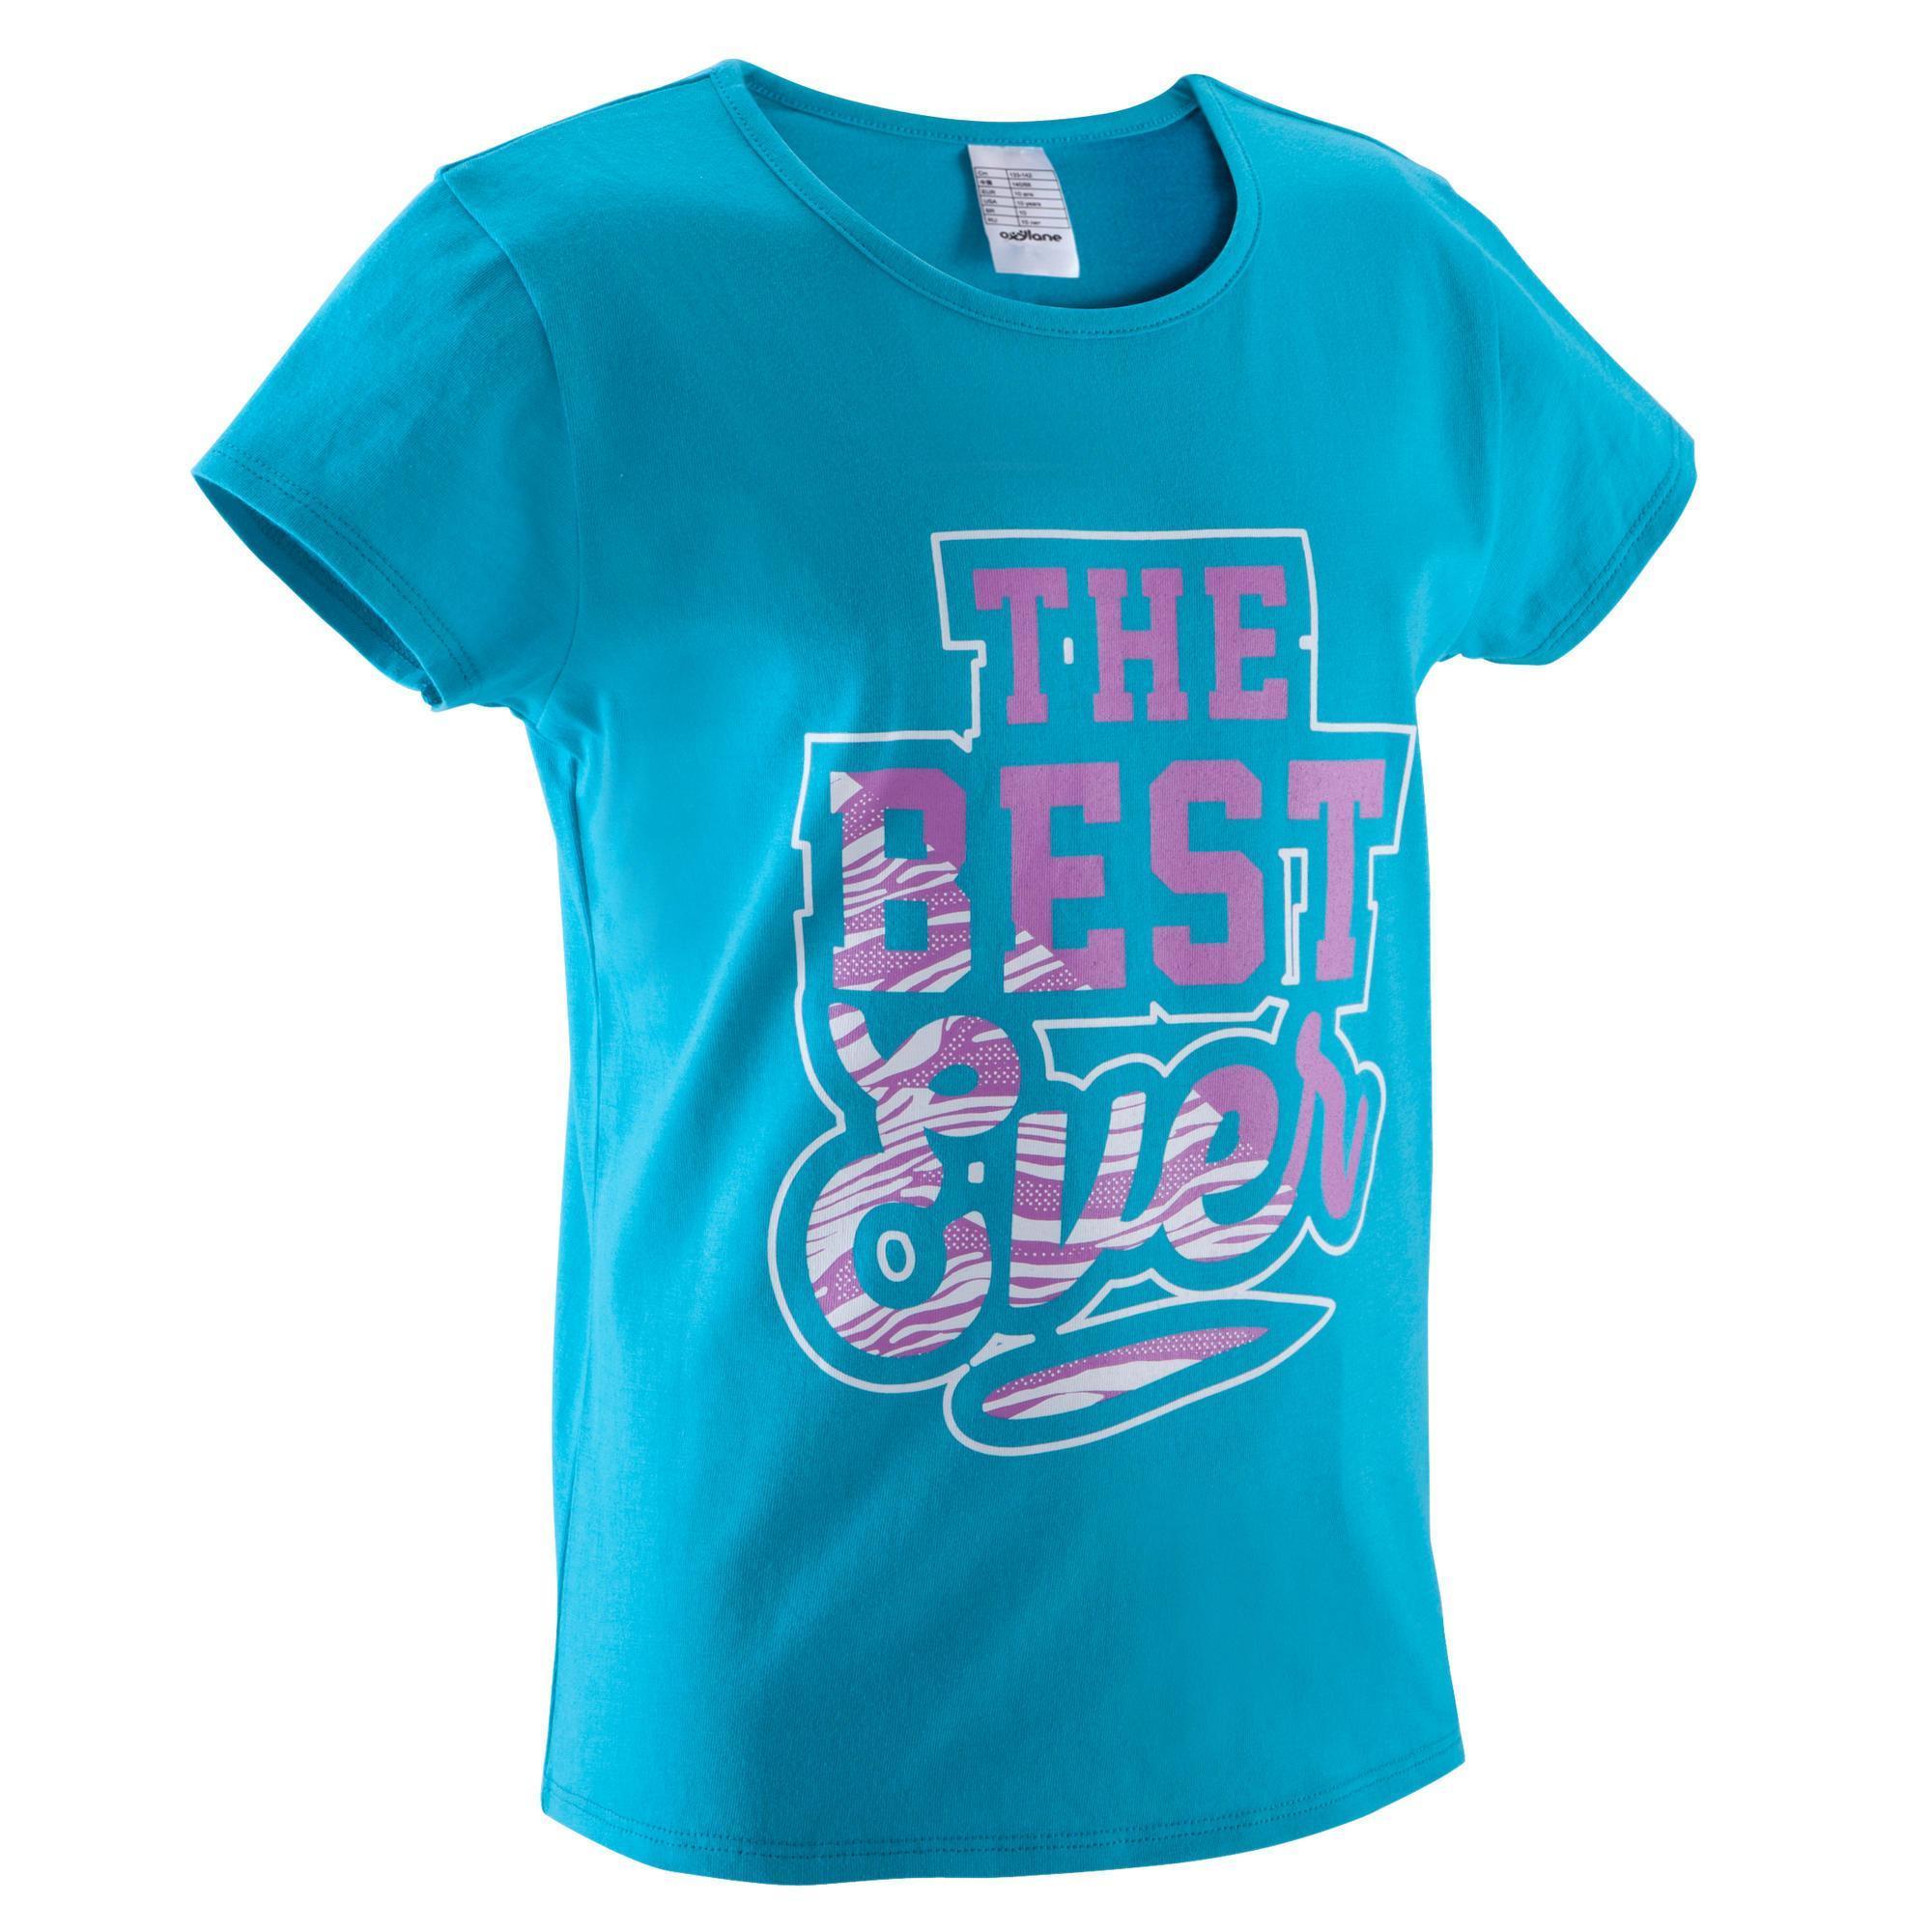 T-shirt fille gym bleu  8106b663dac